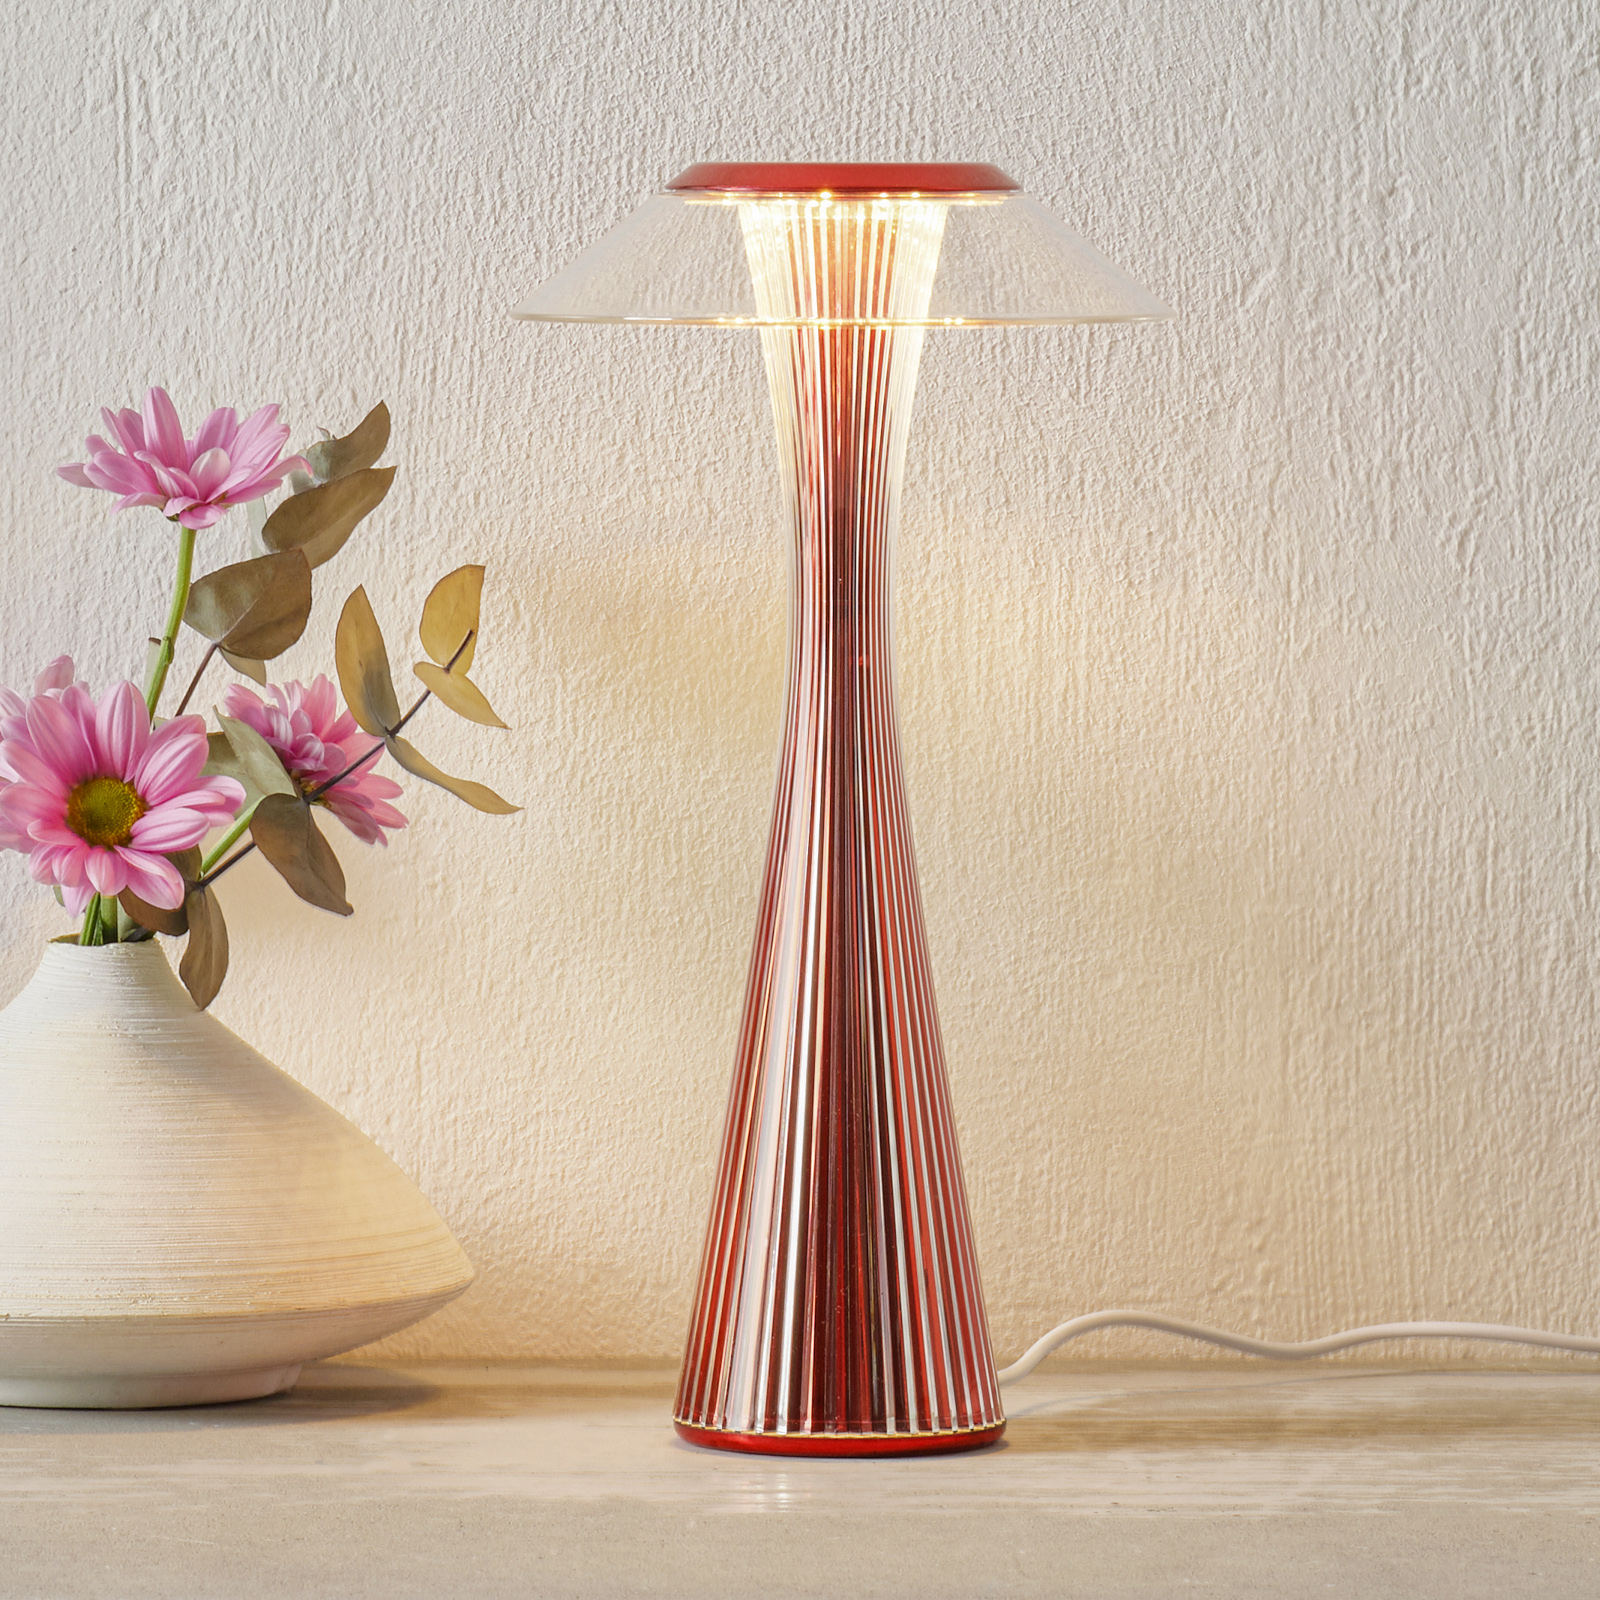 Kartell Space LED-bordlampe rød Limited Edition